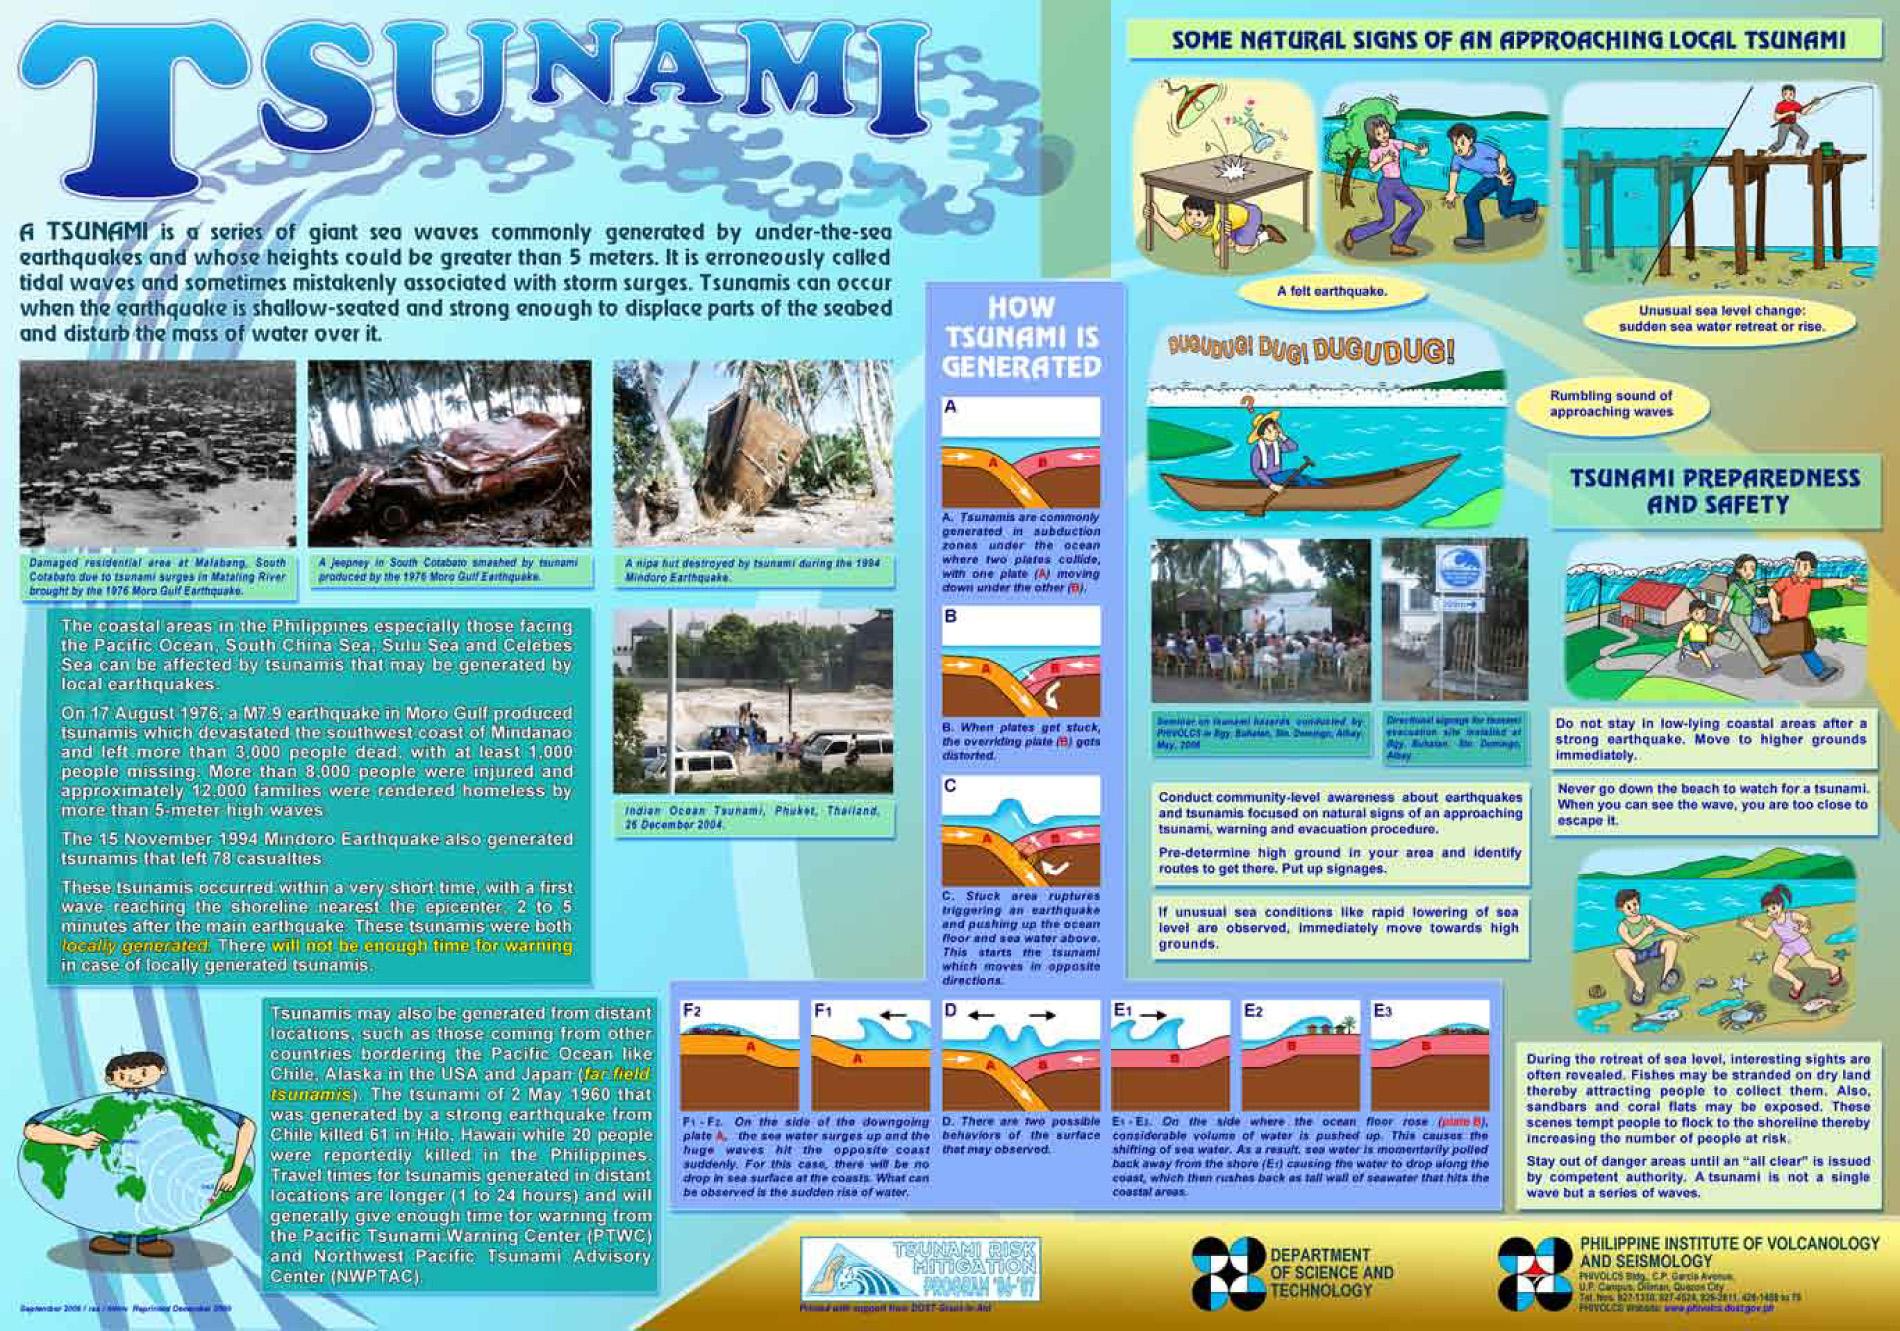 Earthquake And Tsunami 101 Negros Style